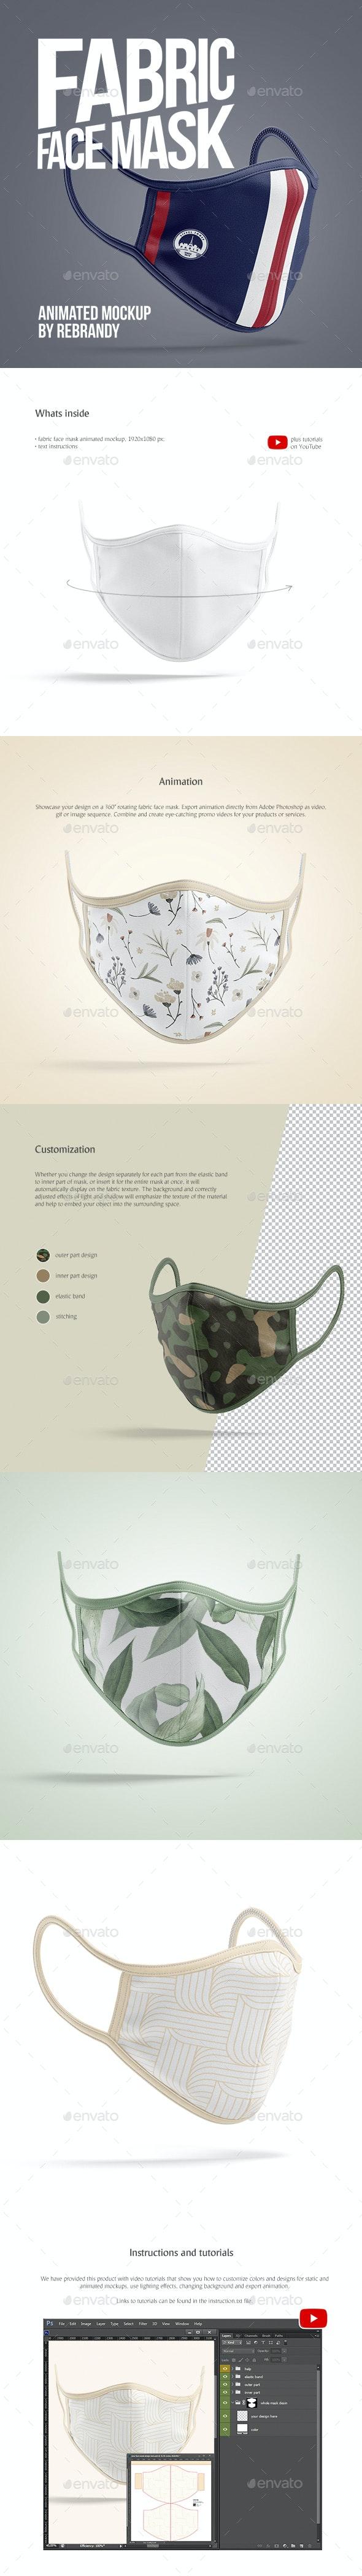 Fabric Face Mask Animated Mockup - Product Mock-Ups Graphics